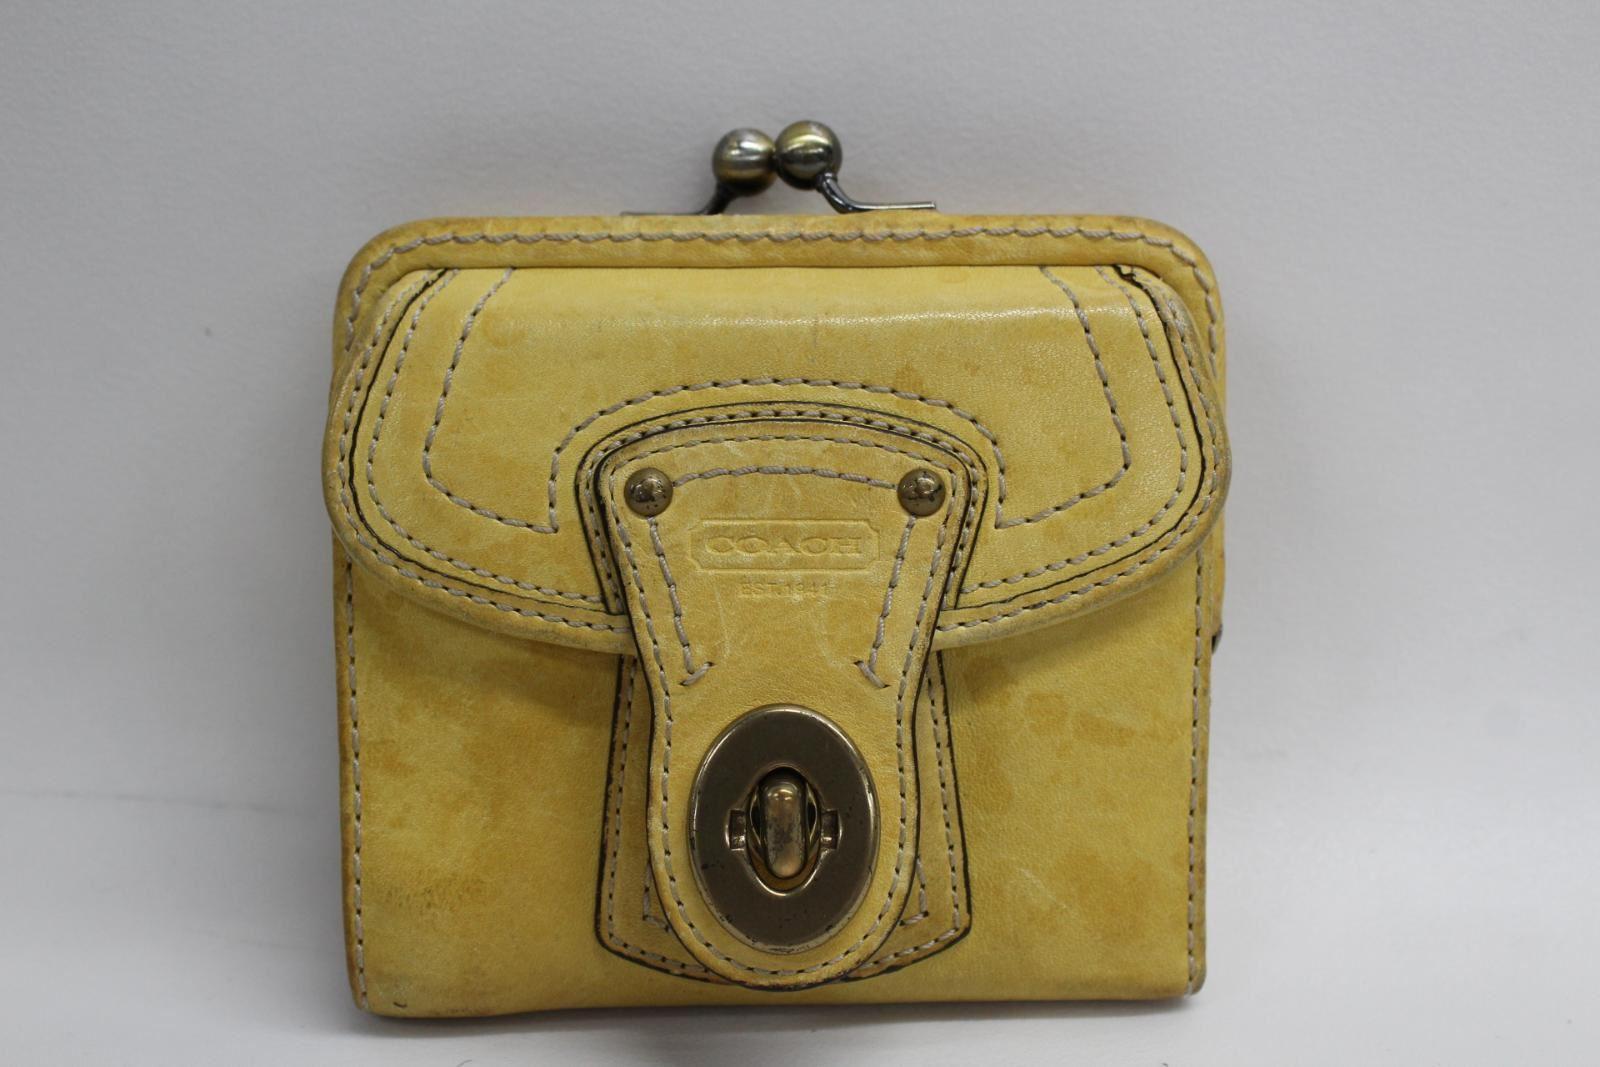 COACH-Ladies-Yellow-Small-Purse-Clasp-Closure-Pink-Interior-Card-Slot-Handbag